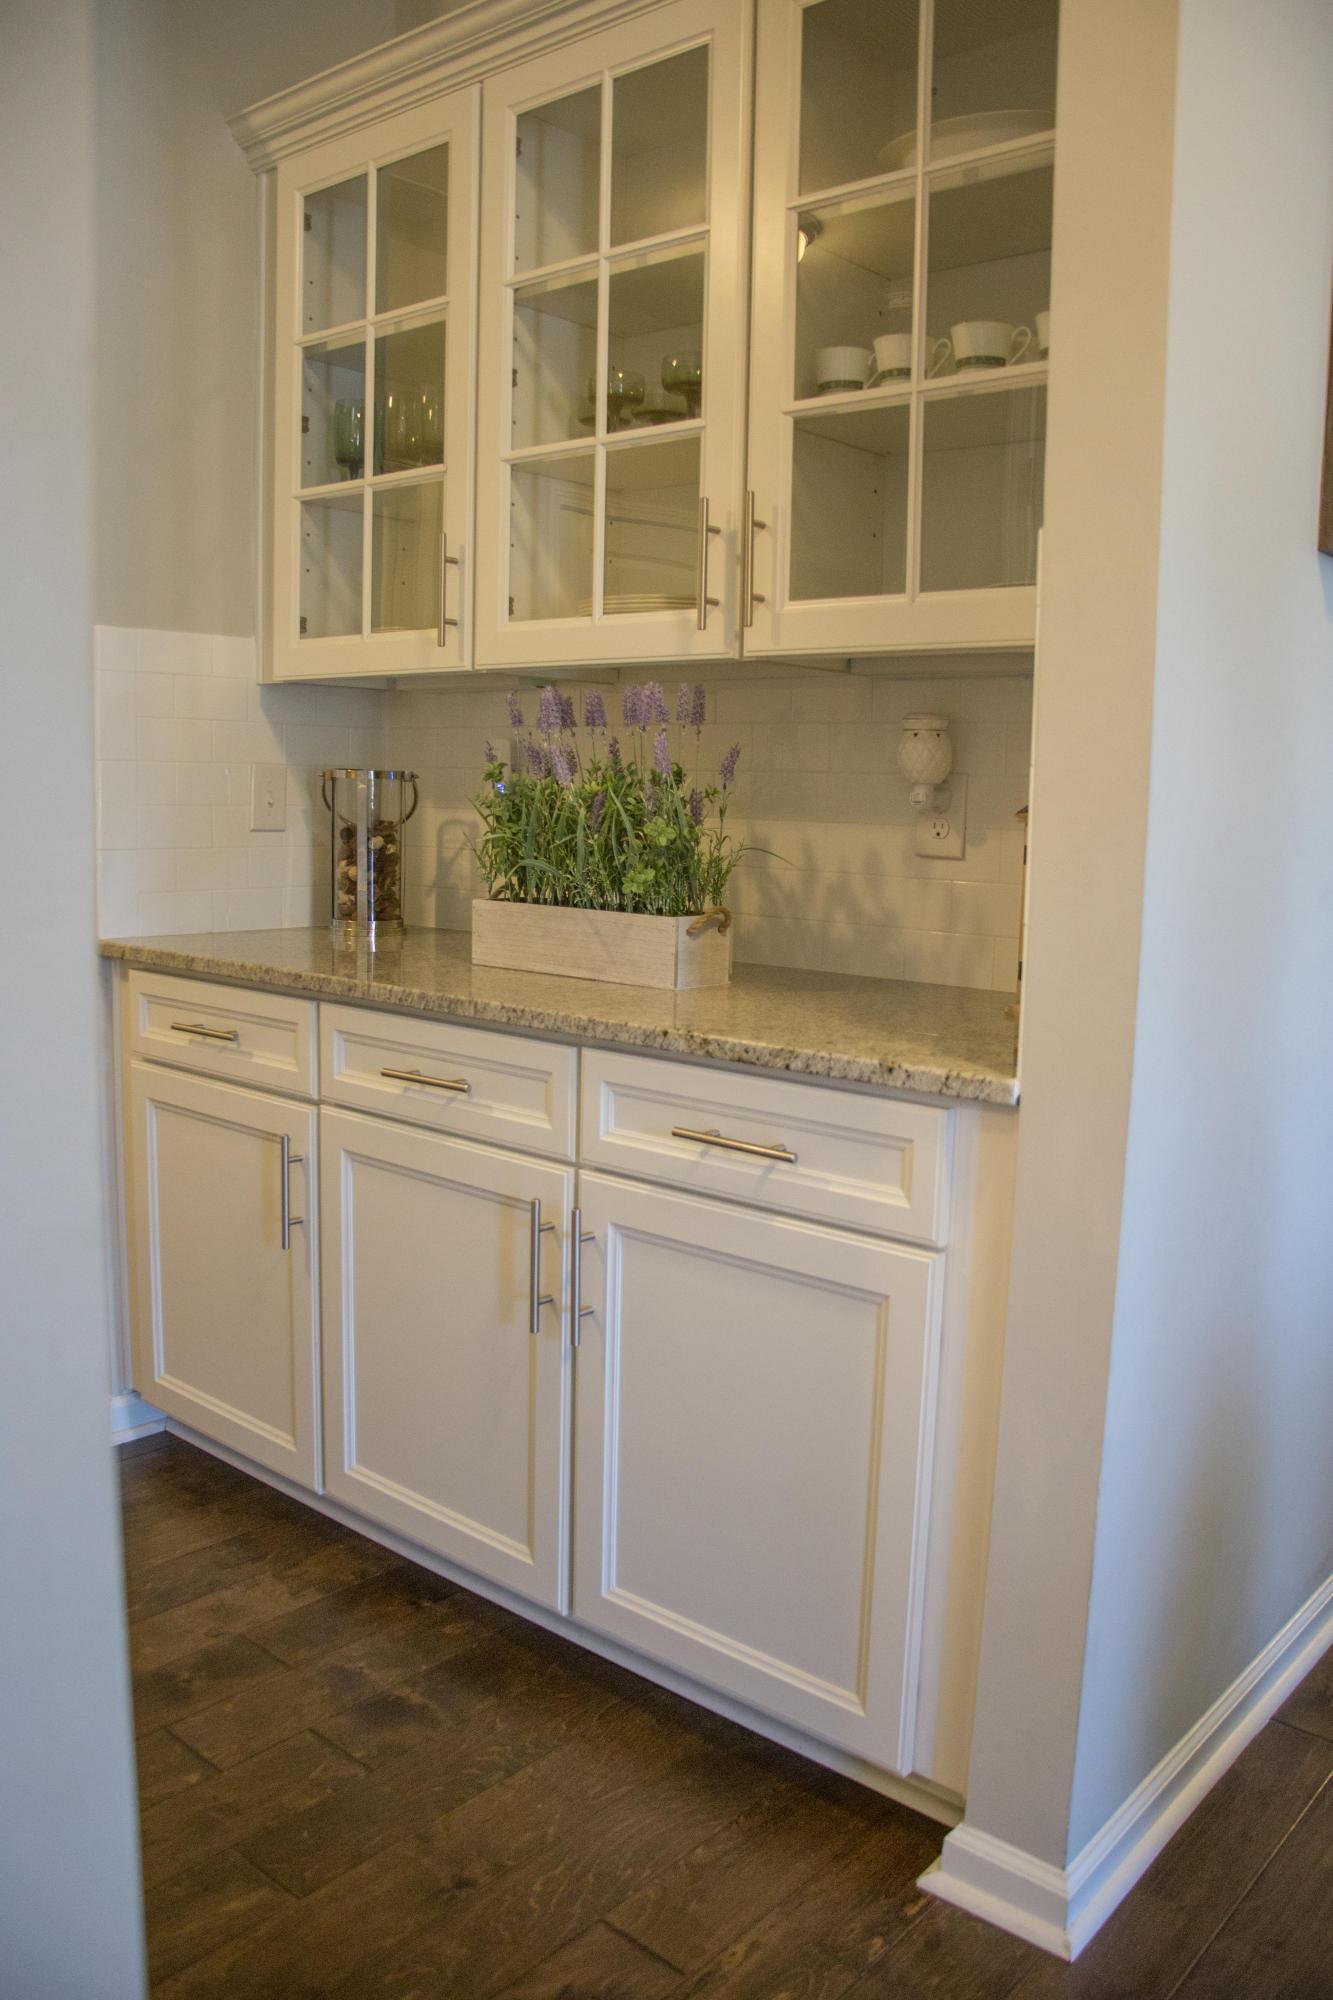 Cane Bay Plantation Homes For Sale - 355 Saxony, Summerville, SC - 22